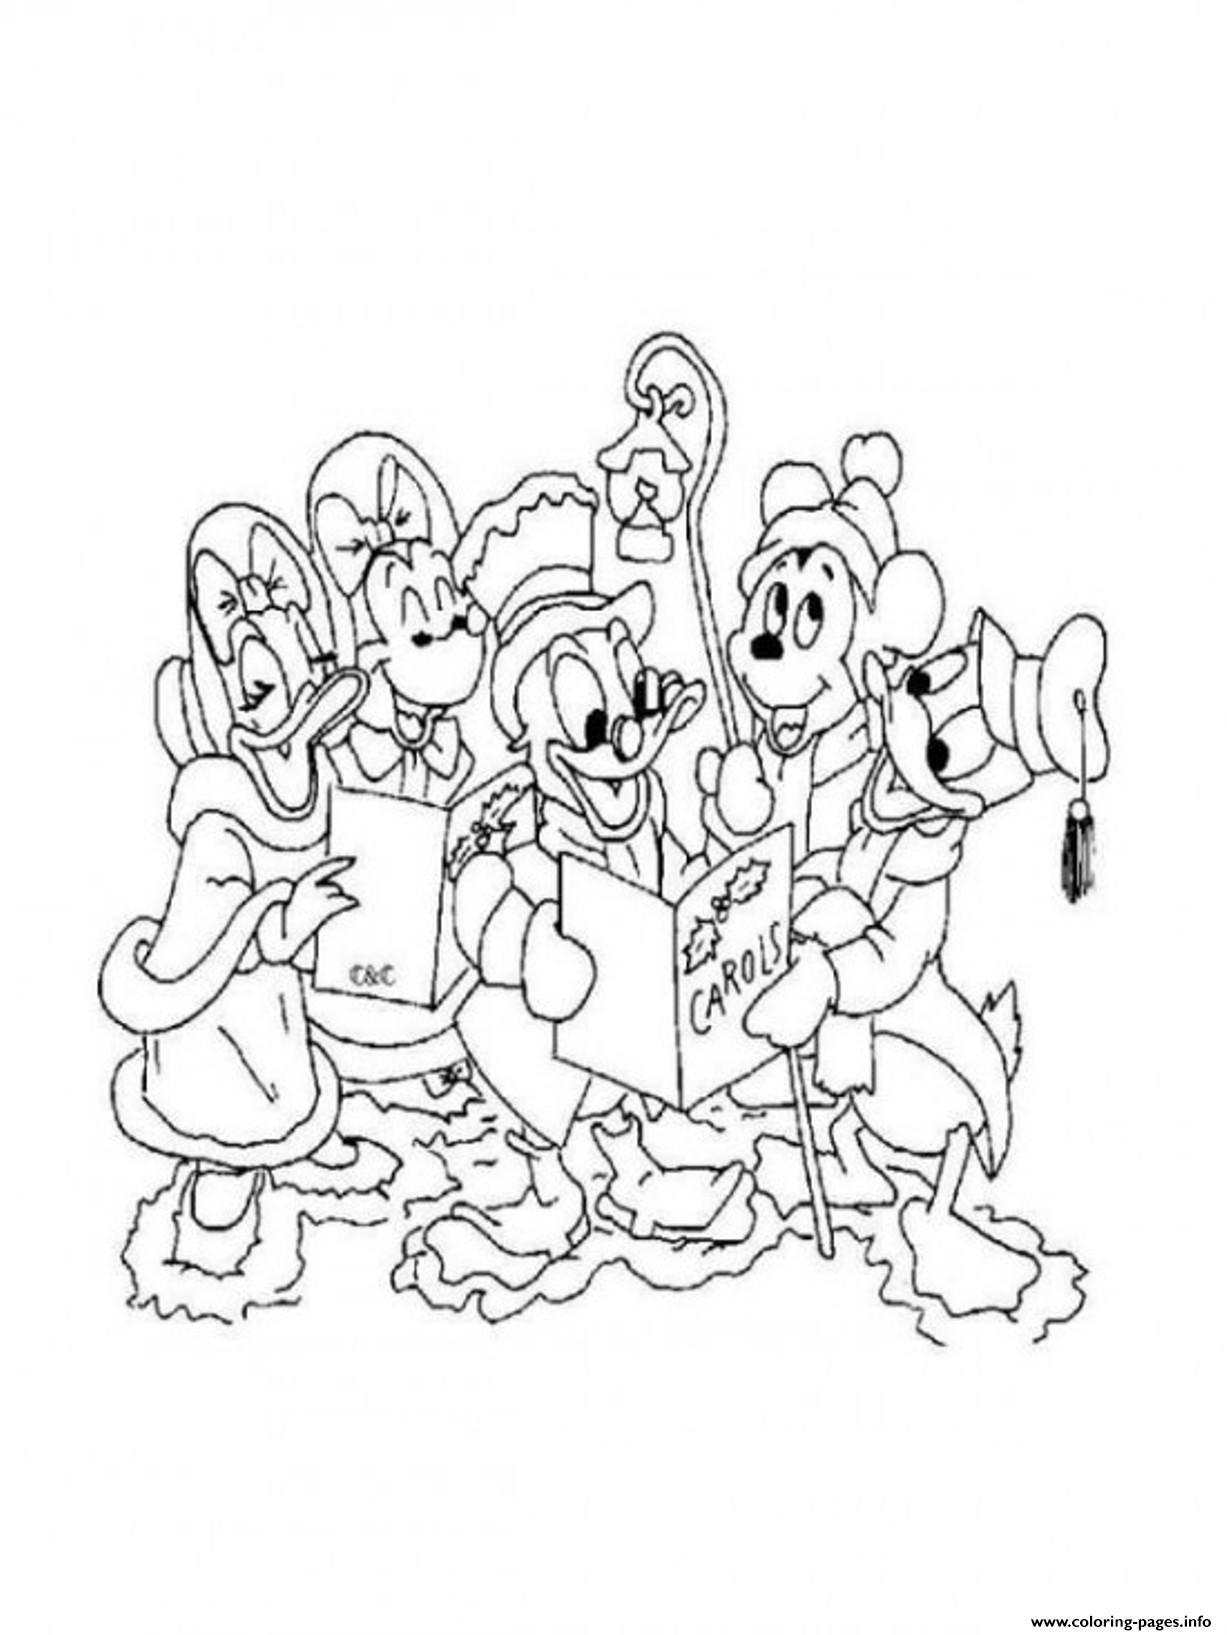 Disney Christmas Printable Freef876 Coloring Pages Printable